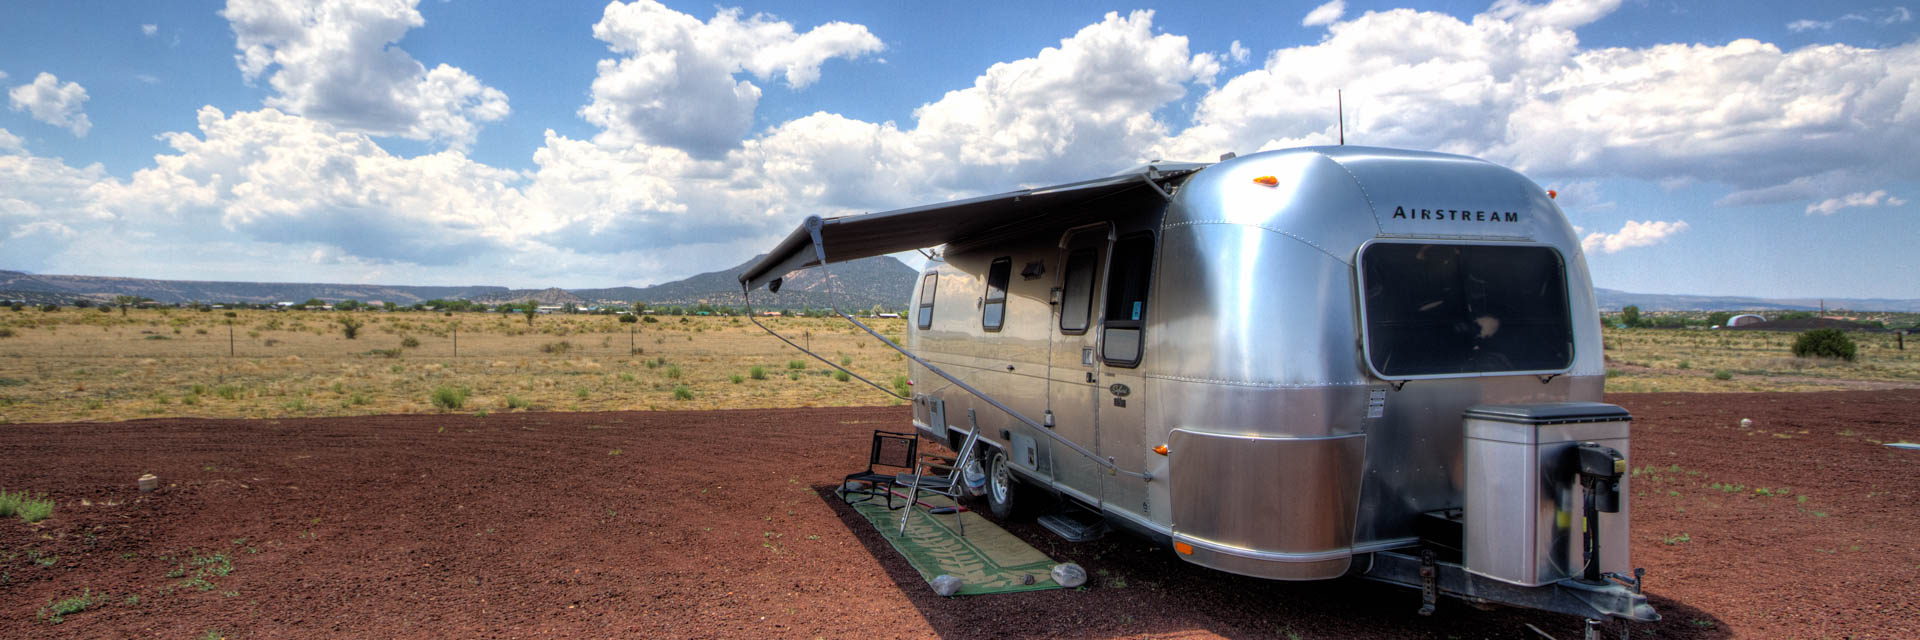 Airstream RV Camping at Springerville RV Park